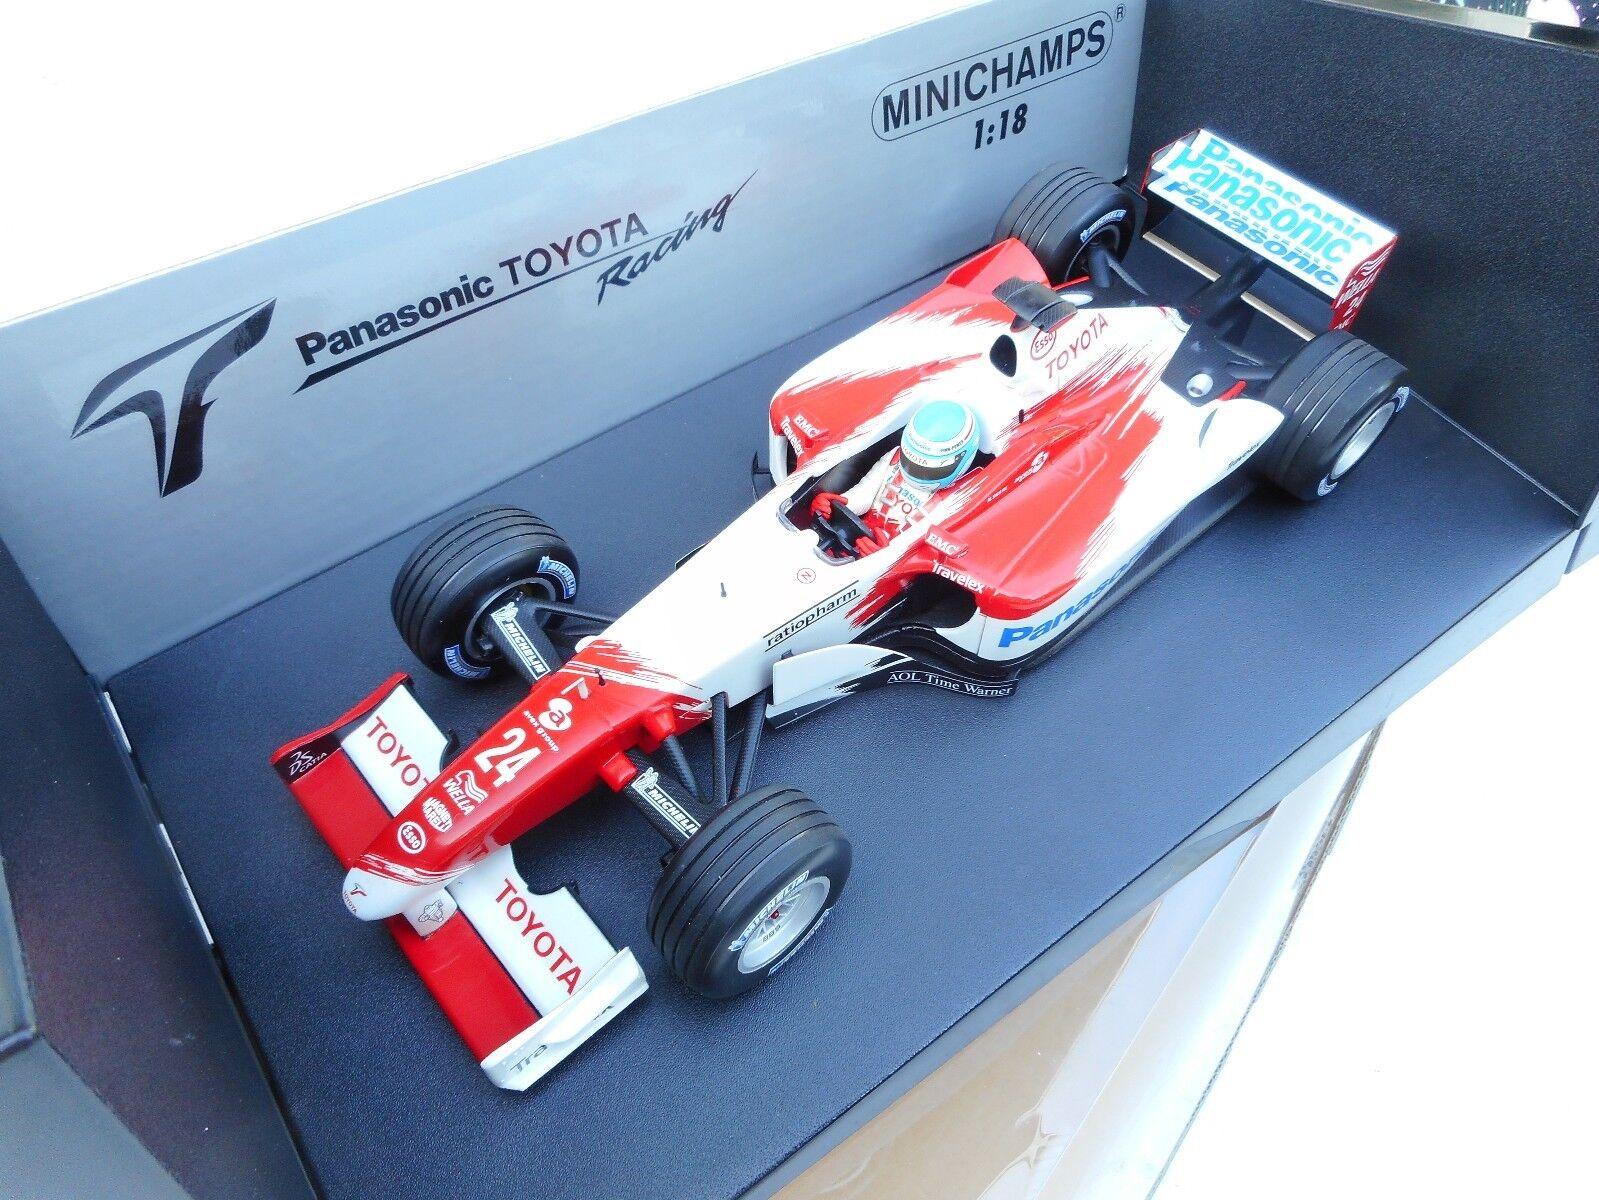 MINICHAMPS TOYOTA TF102 F1 model racing car Mika Salo 2002 1 18th MB